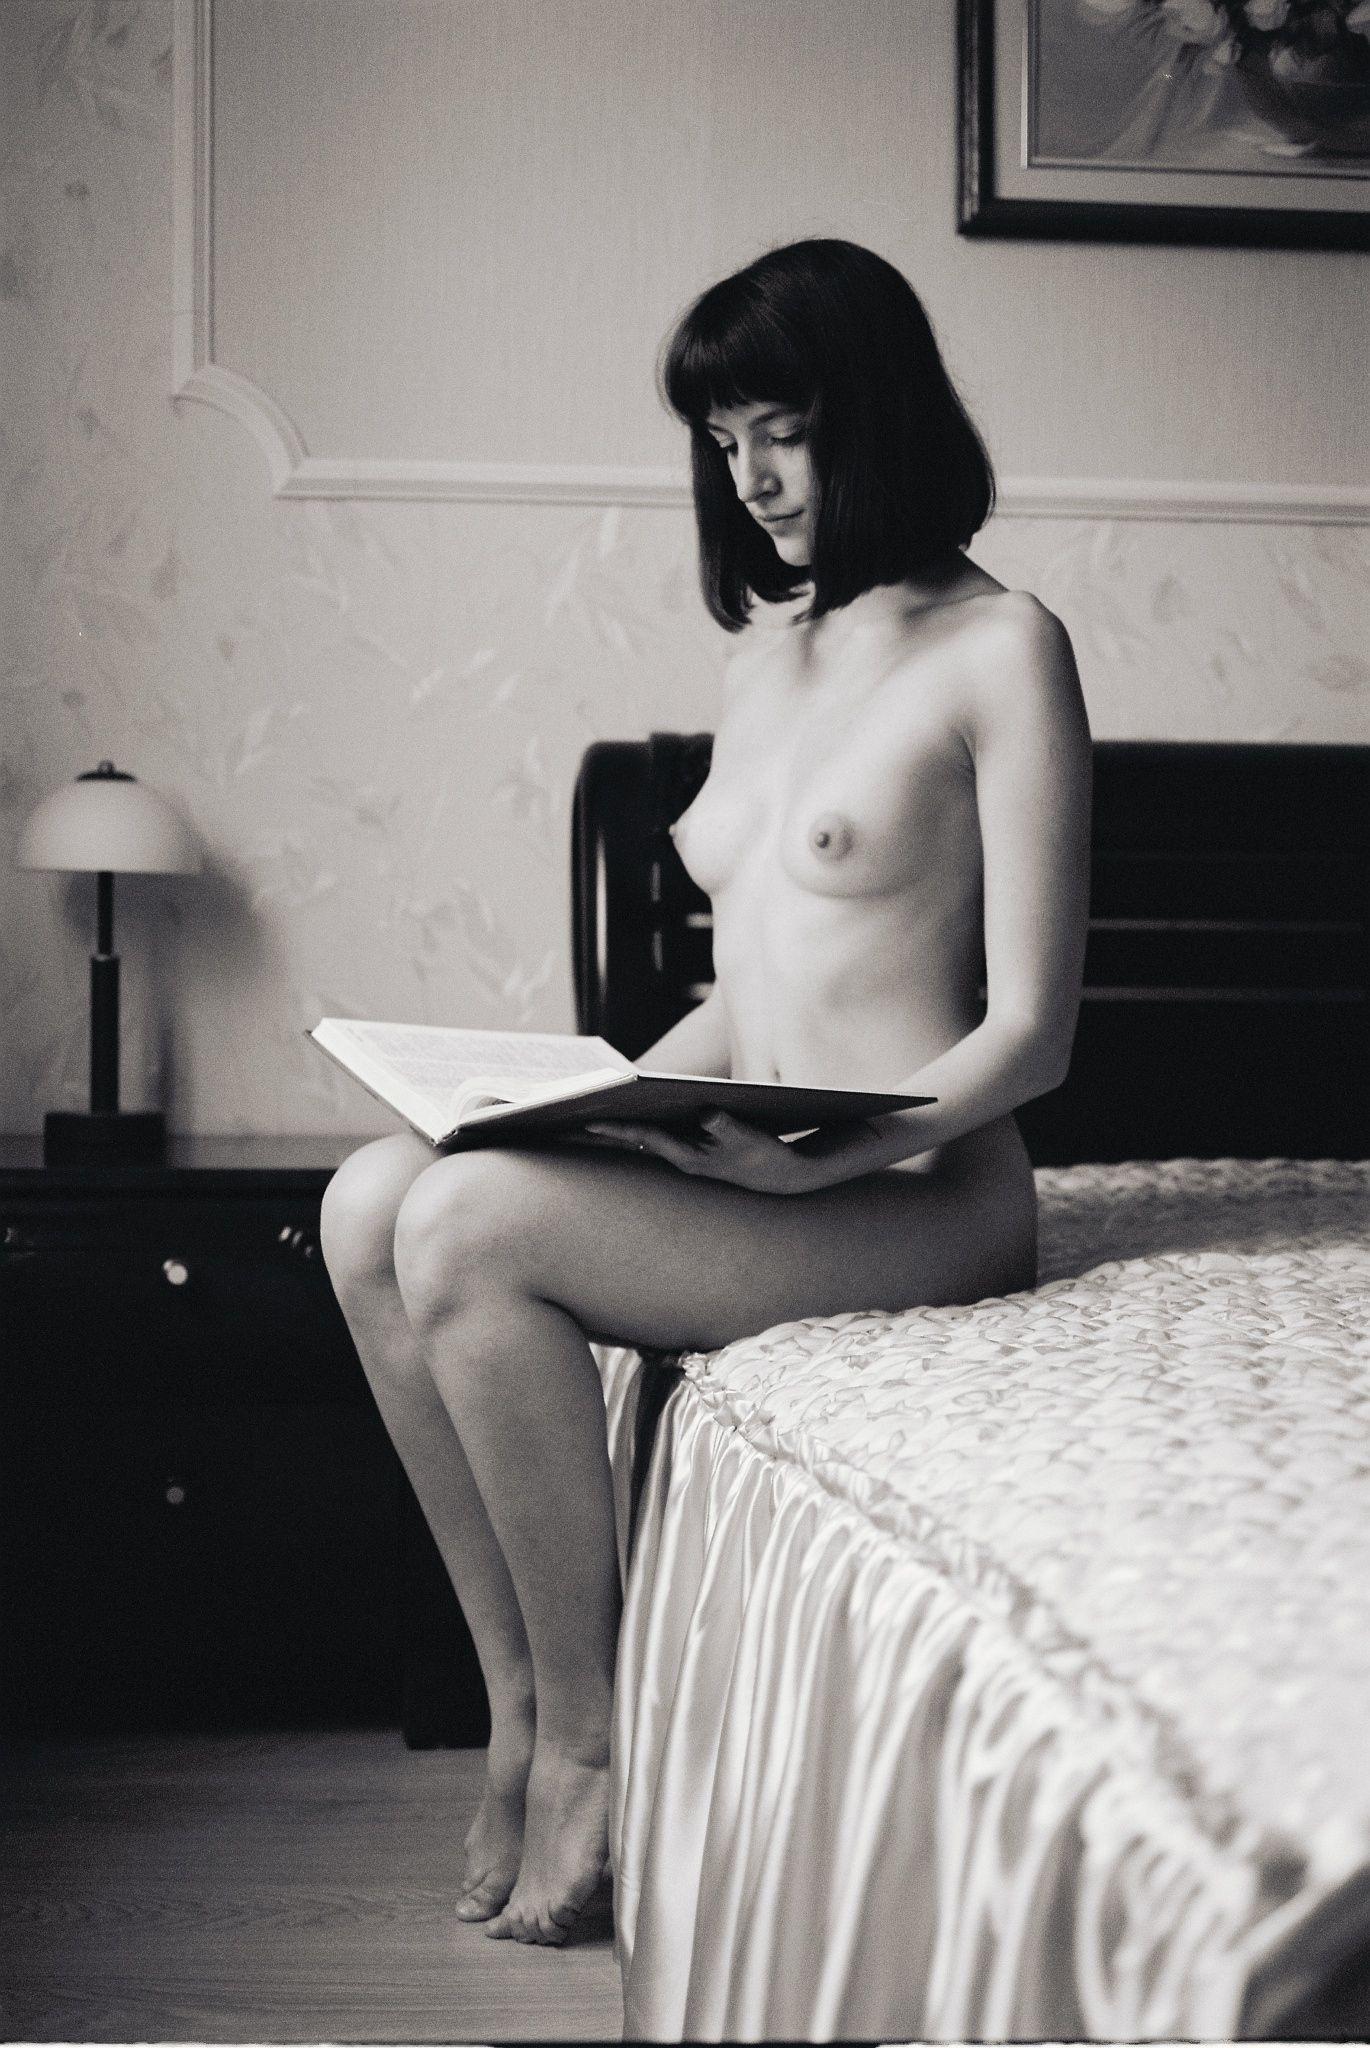 Erotic reading material photos 190